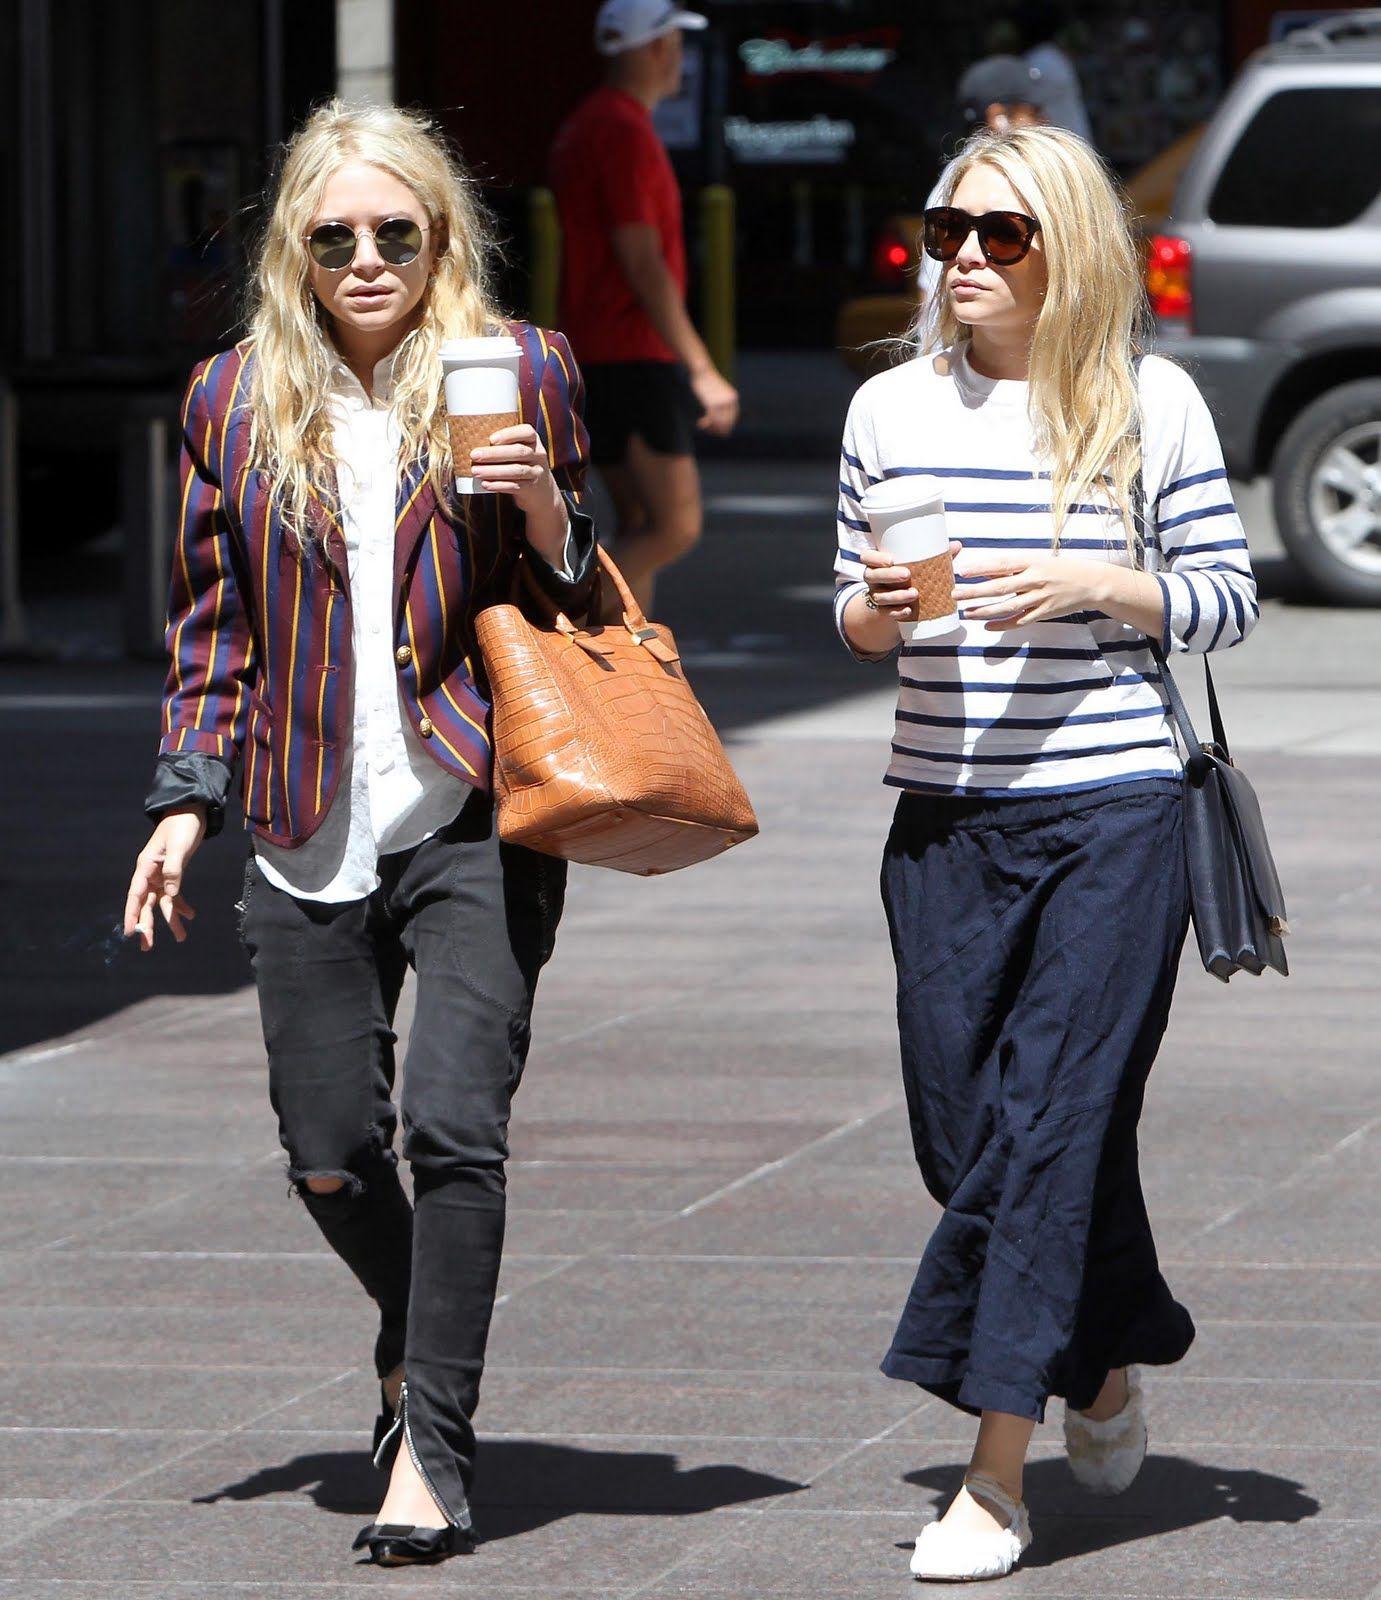 [Shoppegirls] Style. Fashion. Beauty. Parenting. Lifestyle.: Daily Style